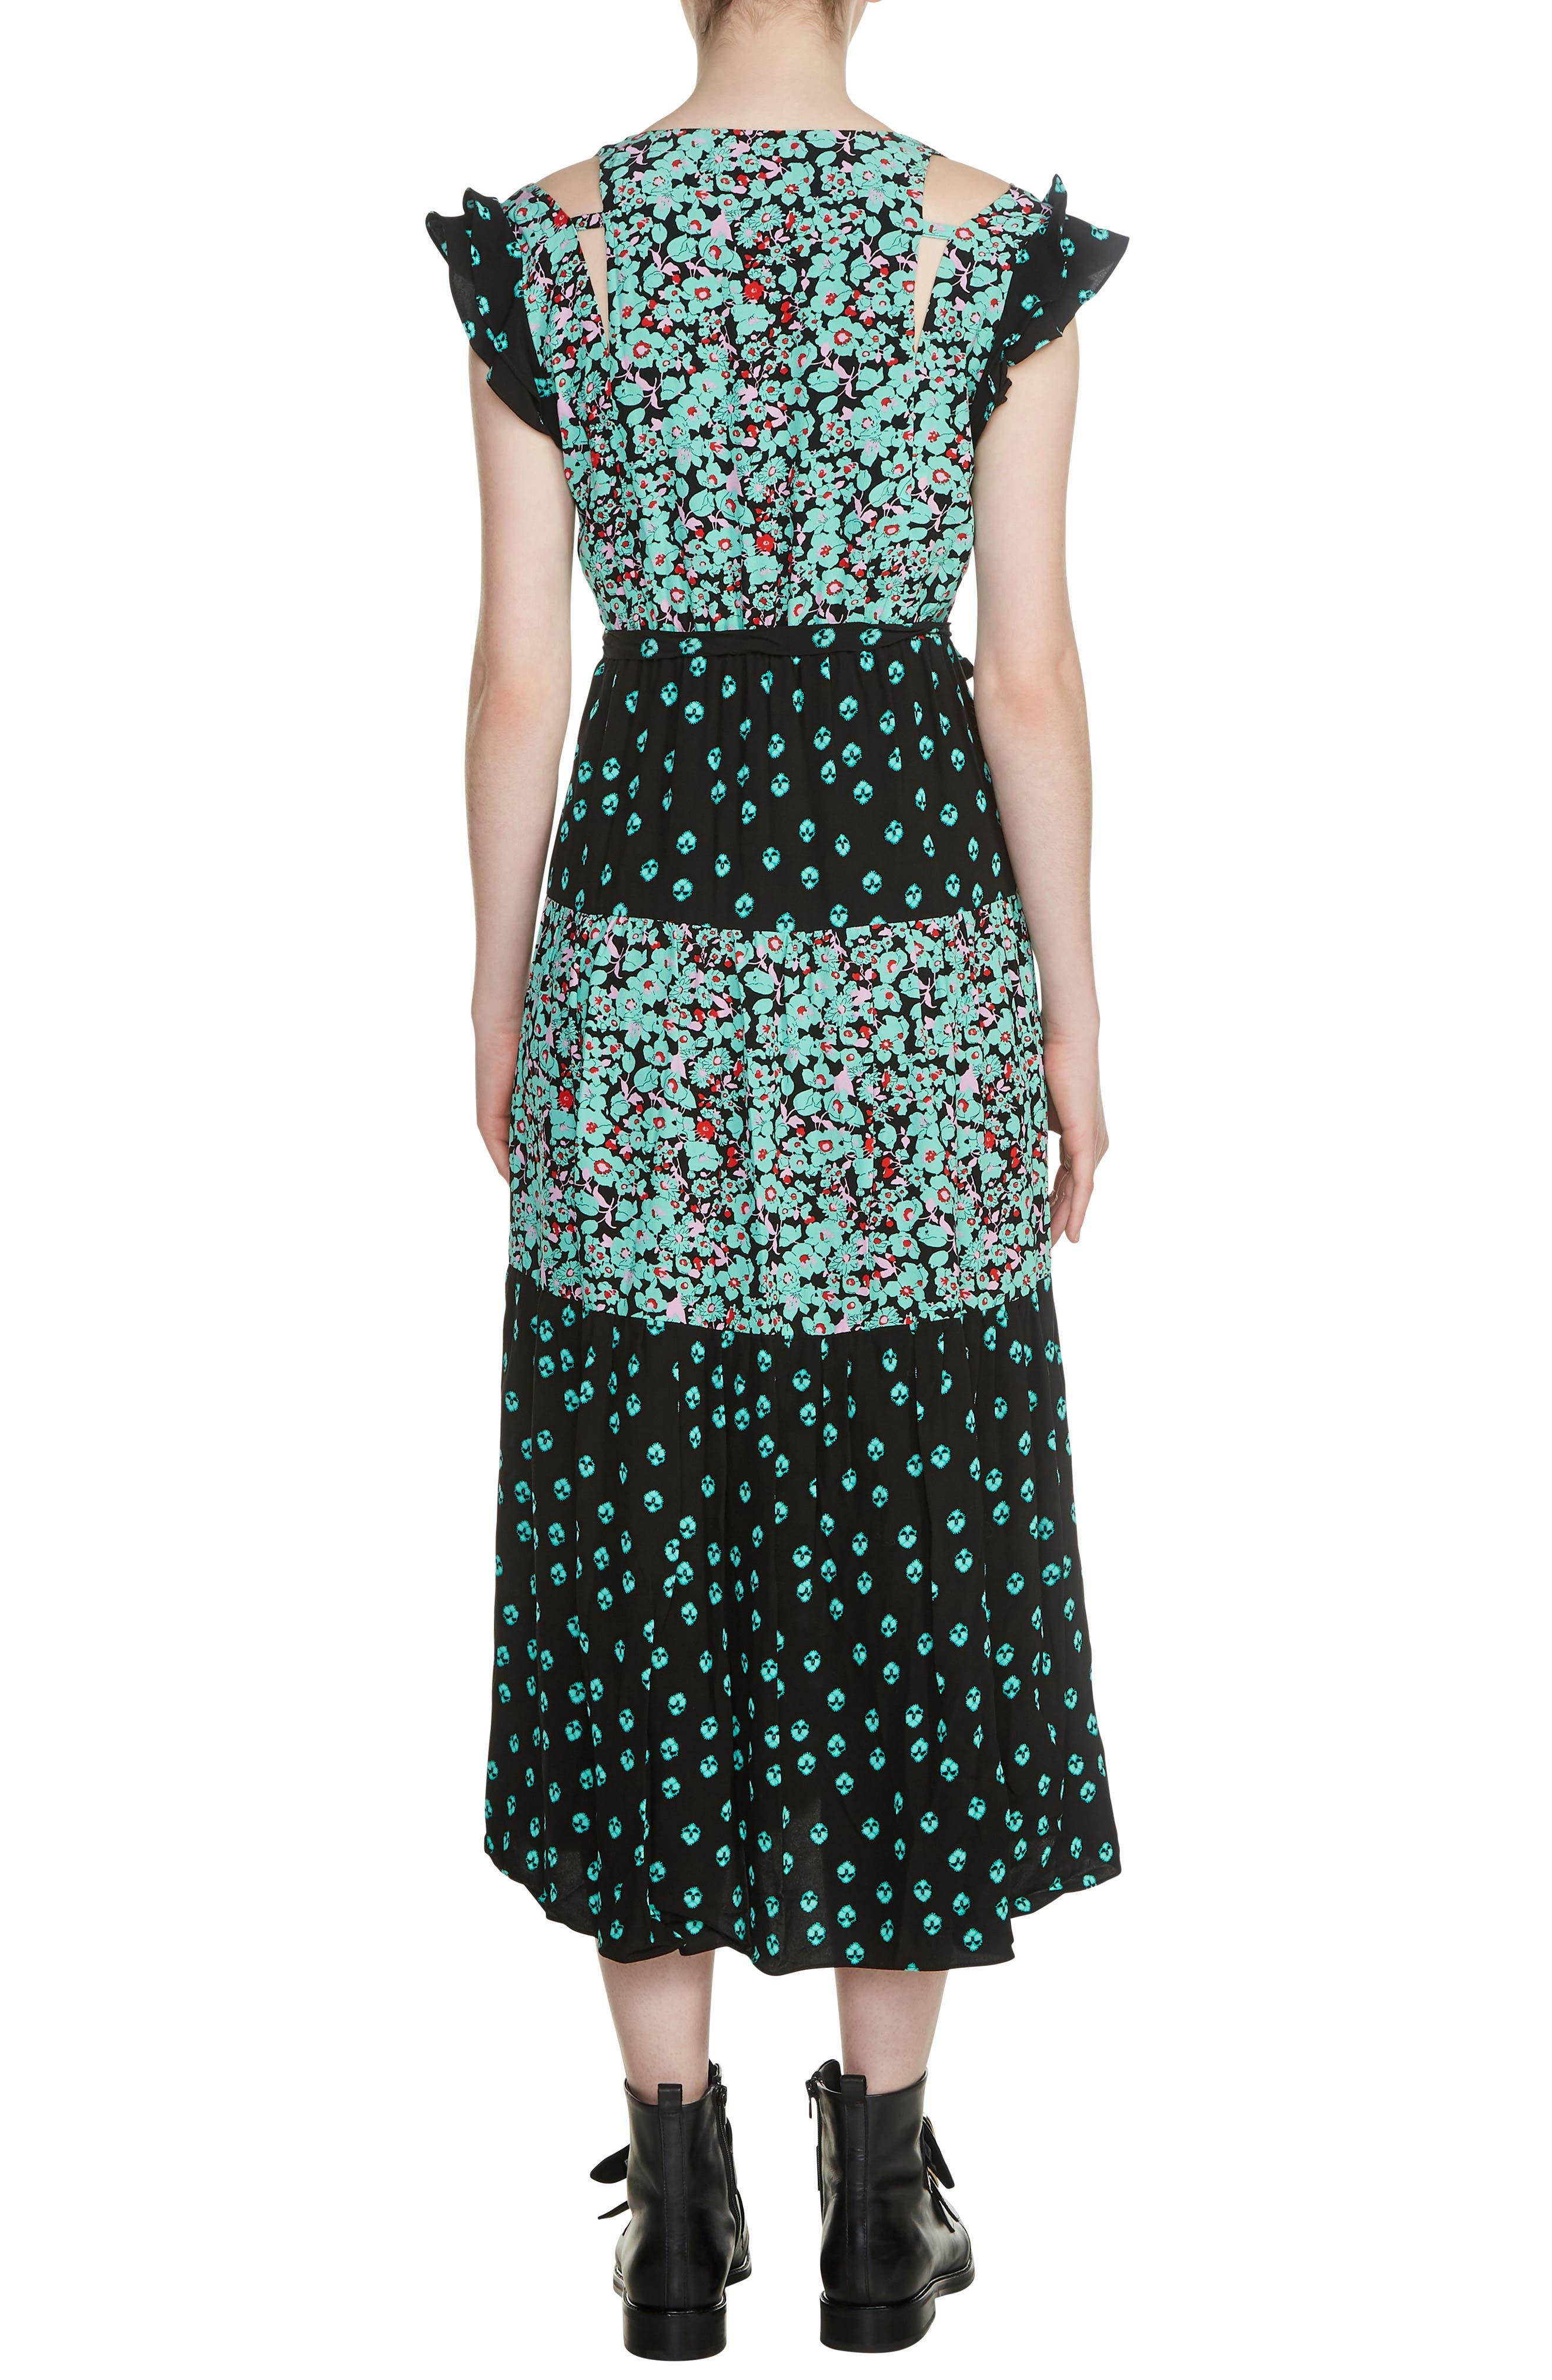 Renoli Mixed Print Midi Dress,                             Alternate thumbnail 2, color,                             300